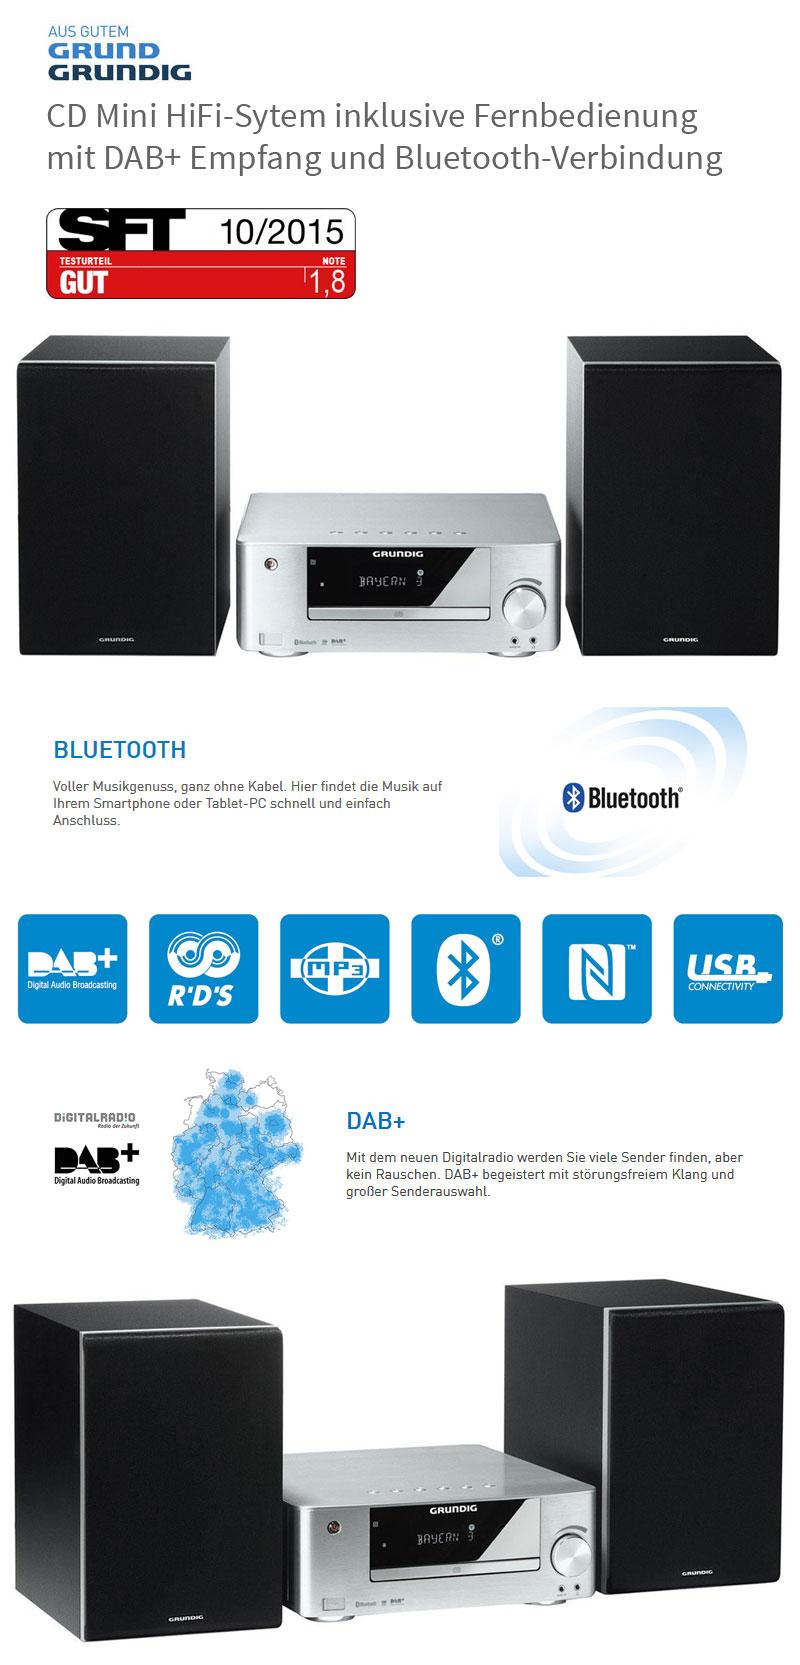 grundig m 2300 dab mini design stereo anlage hifi system. Black Bedroom Furniture Sets. Home Design Ideas